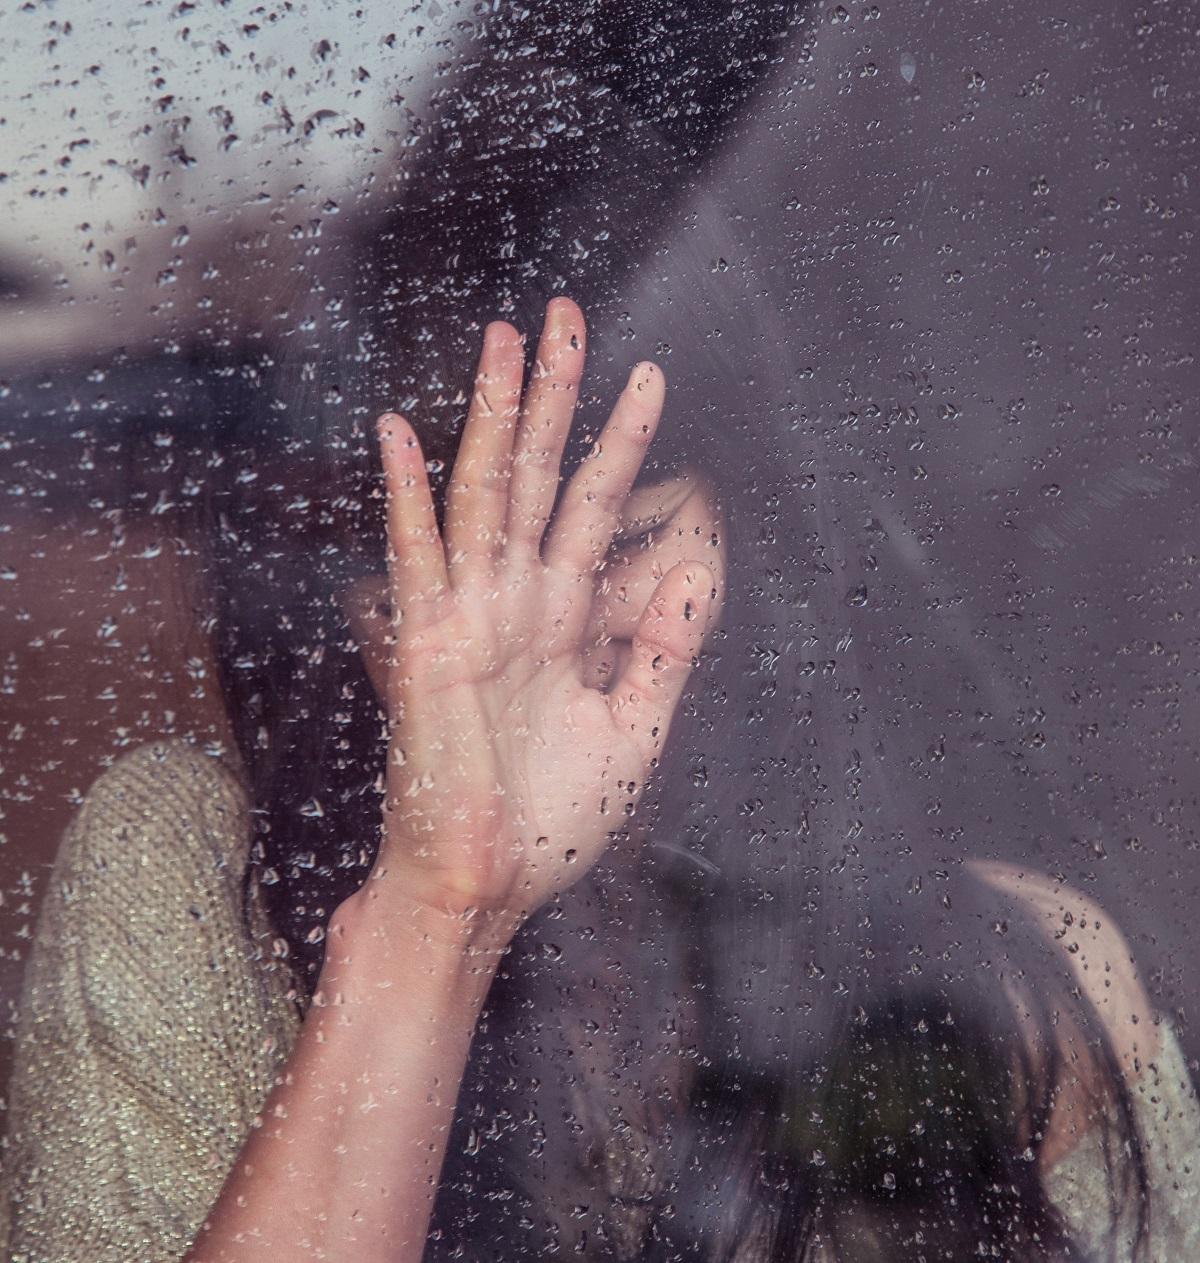 emotii-geam-picaturi-ploaie-femeie-chiar-iti-pasa-ce-cred-altii-despre-tine.jpg